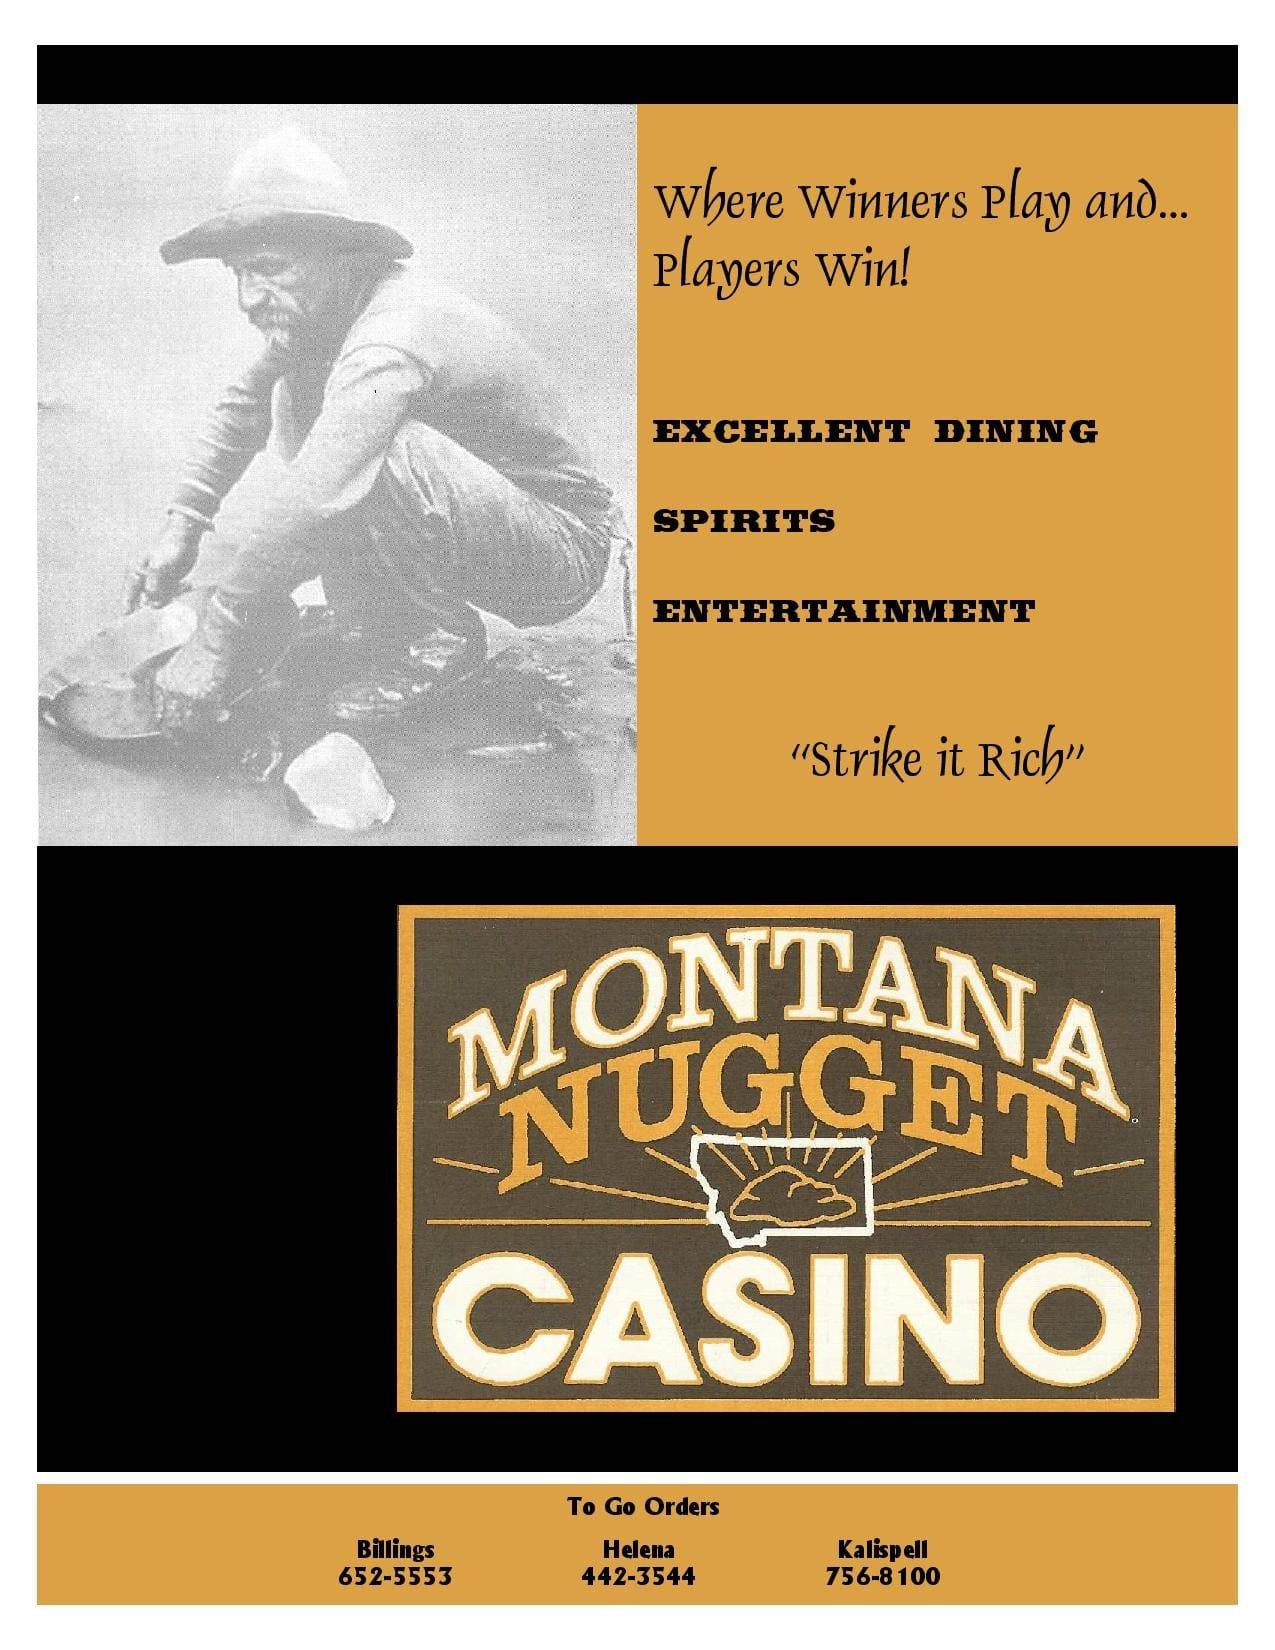 Montana nugget casino menu creek casino in michigan